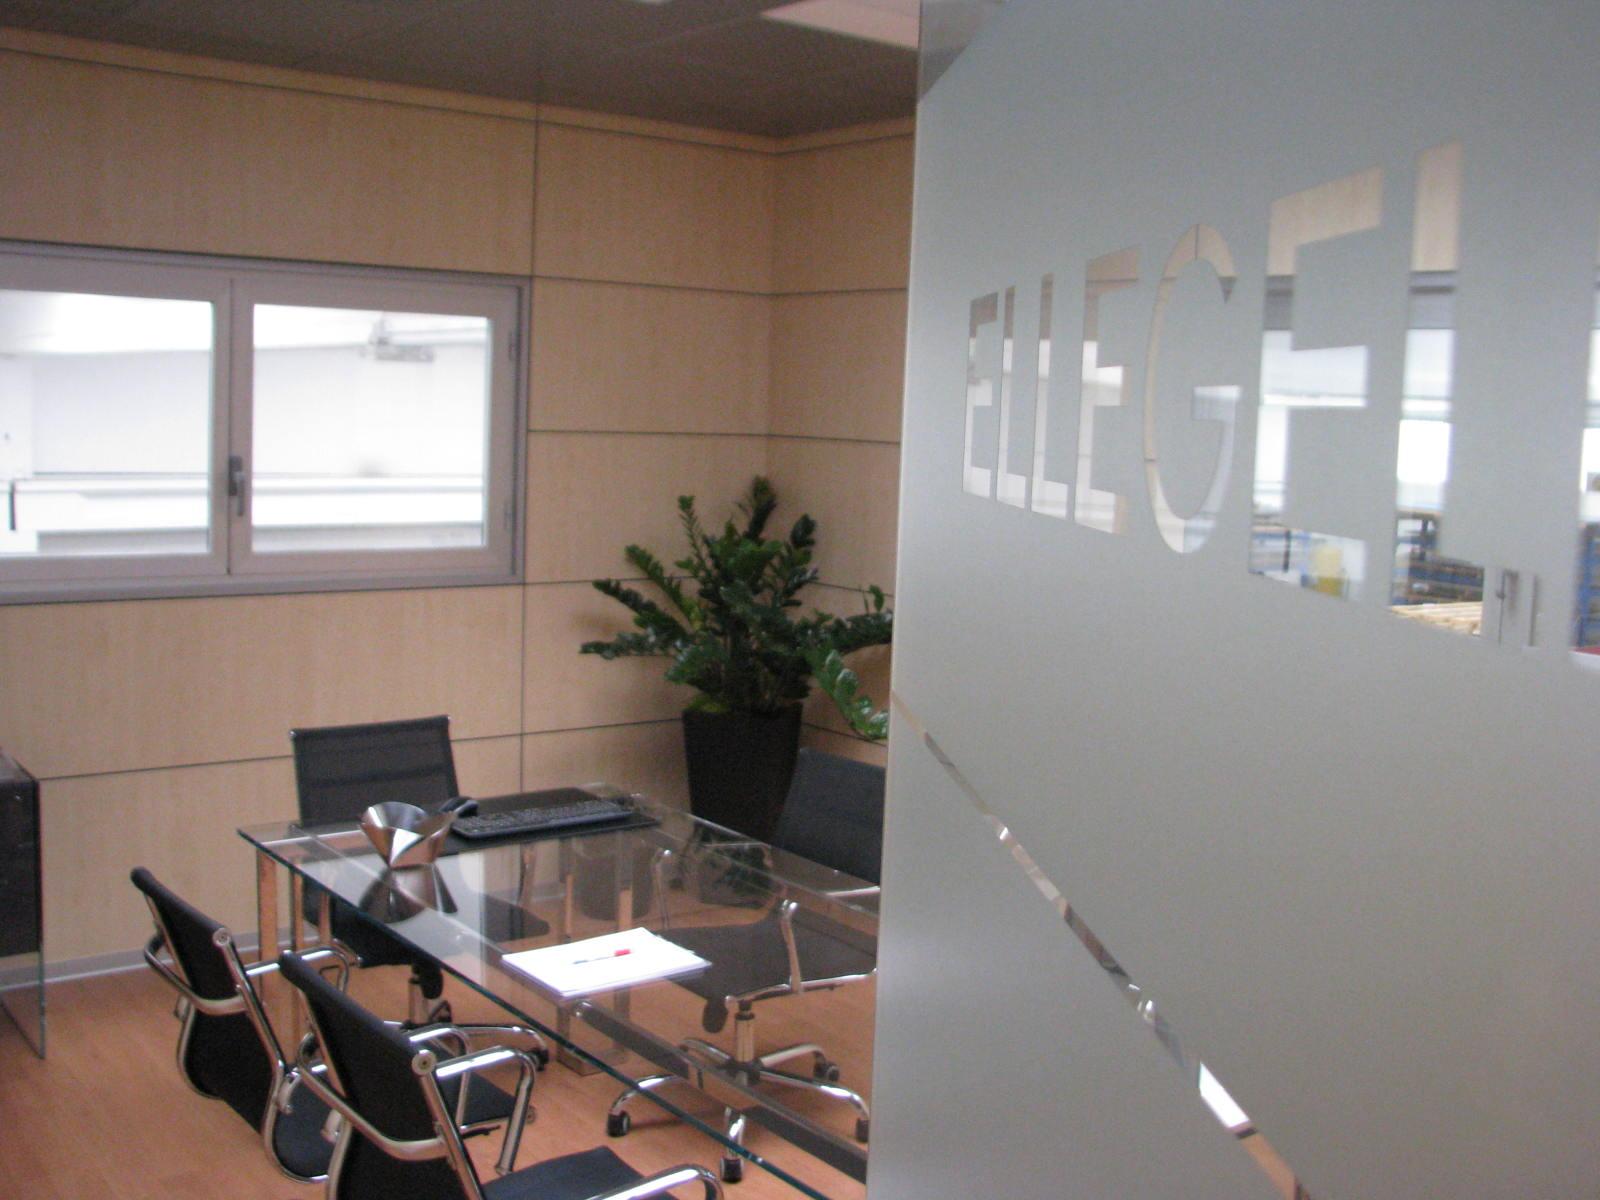 Uffici Ellegelle Machinery